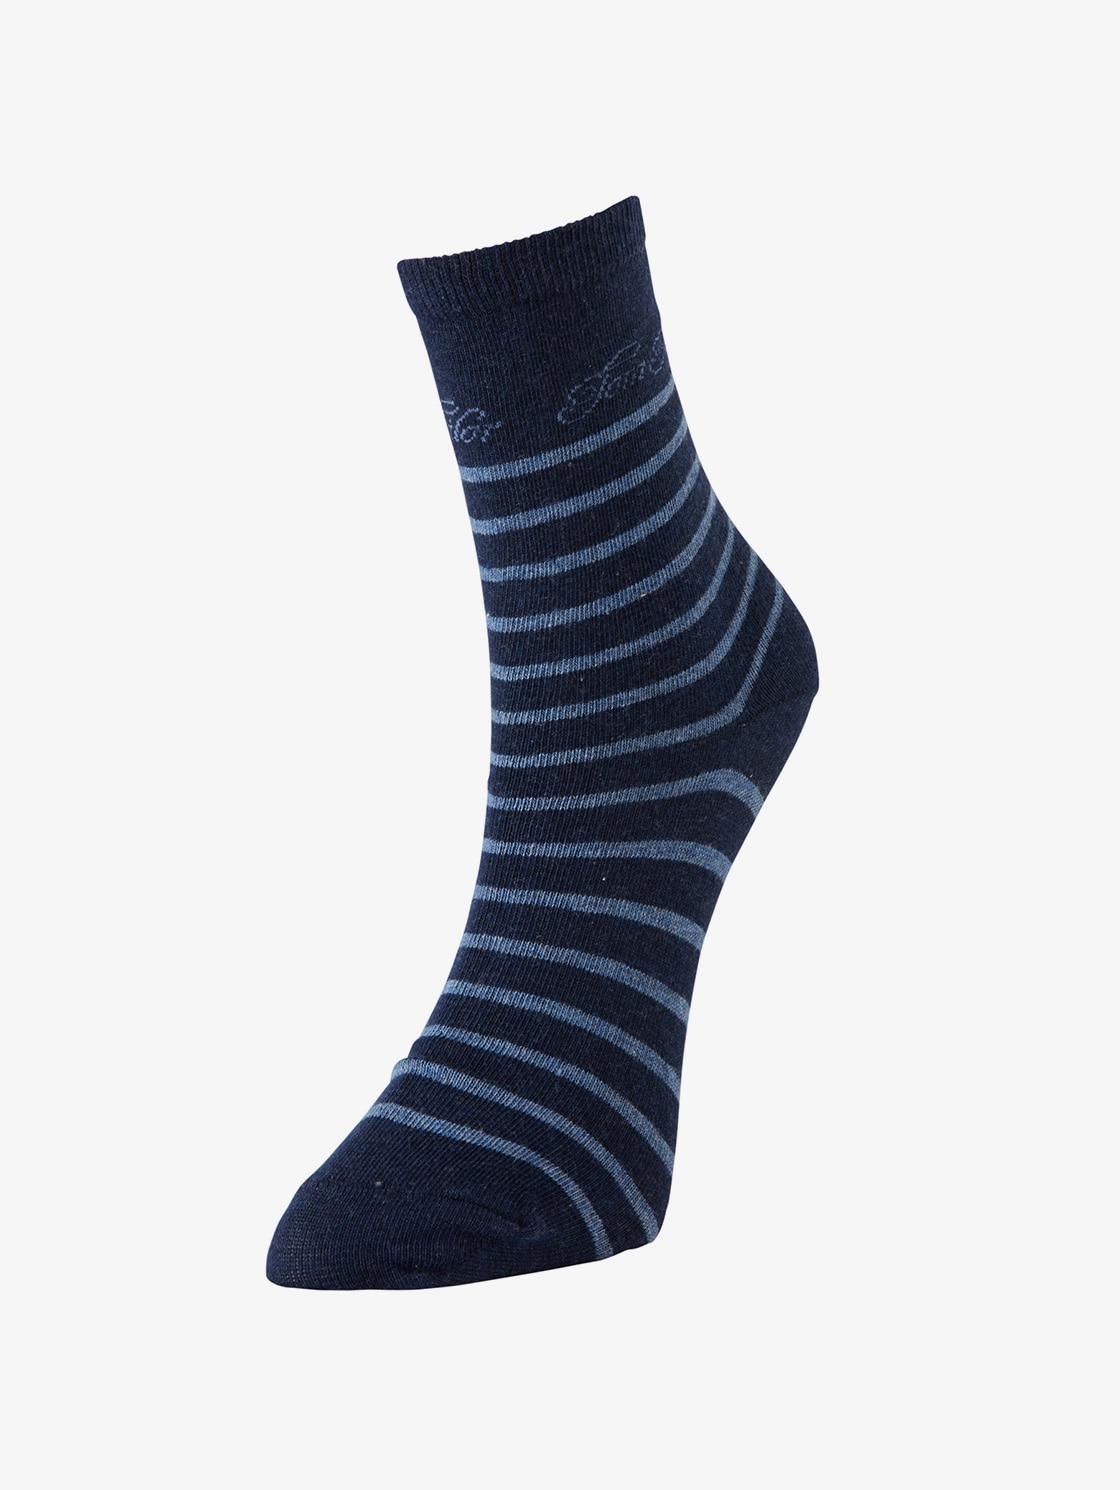 Tom Tailor Casual 2er Pack Socken mit Logo Schrift, Damen, indigo melange, Größe: 35 38